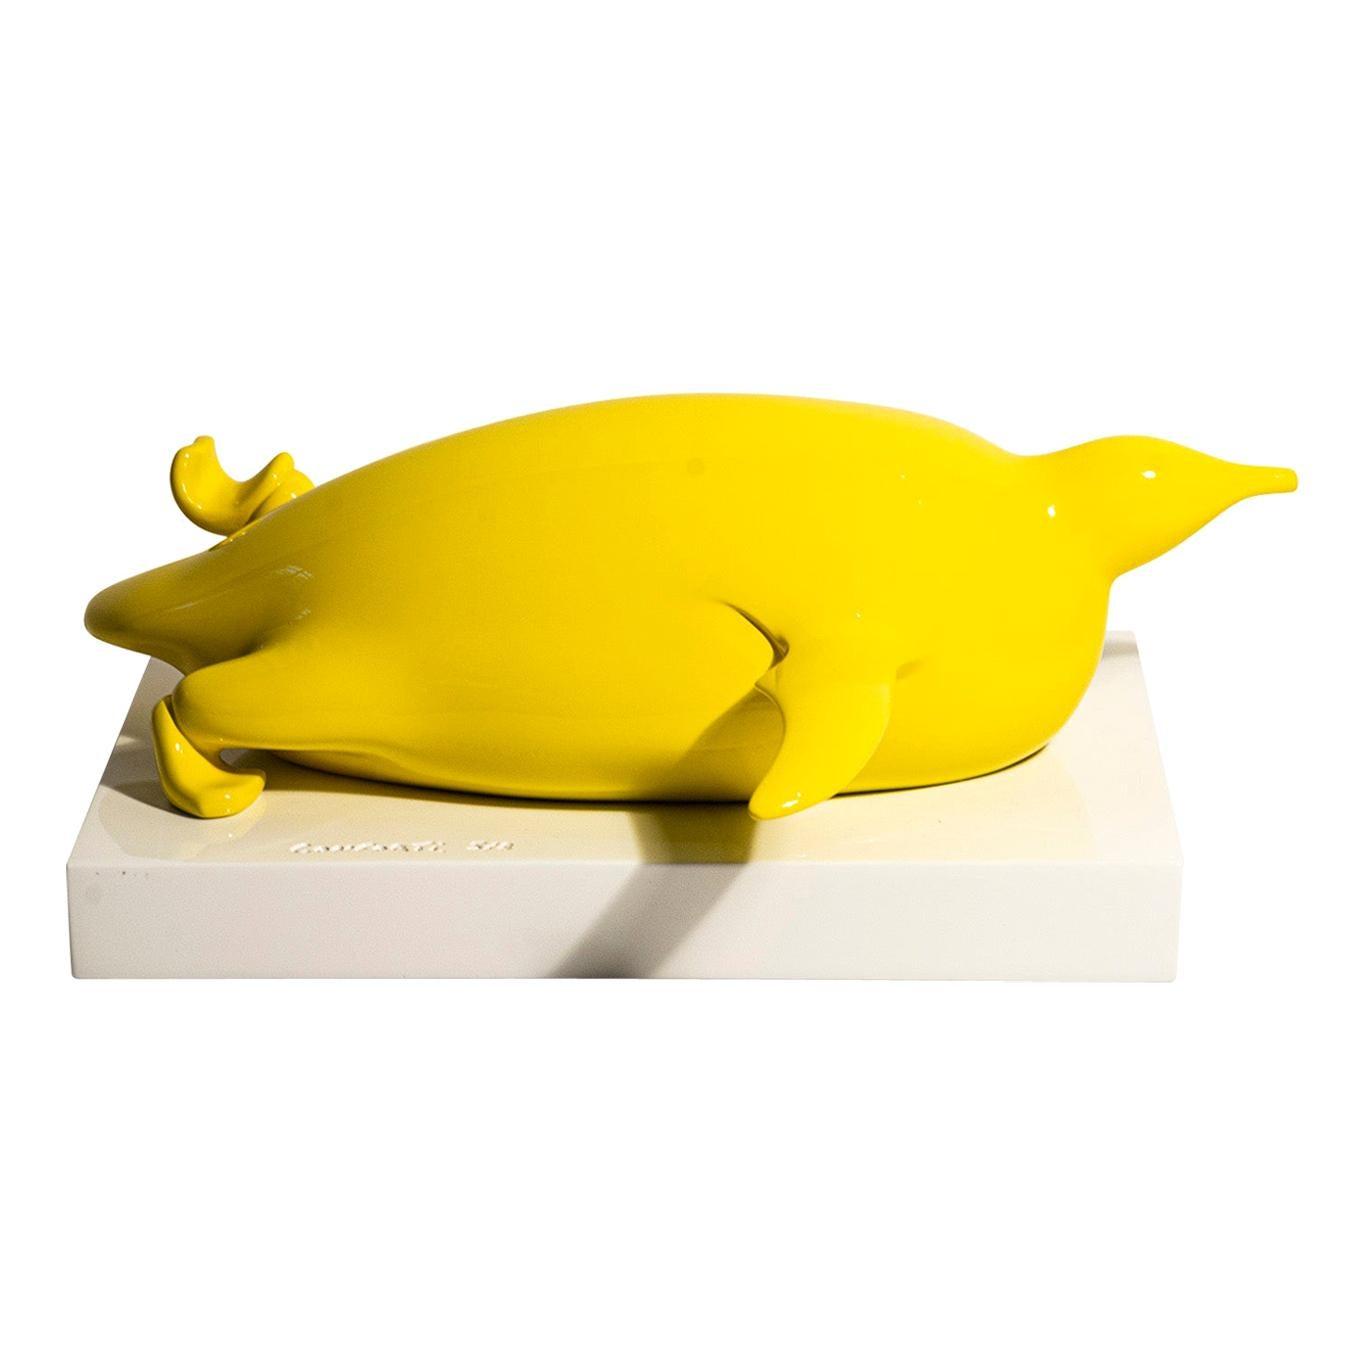 Bernard Conforti, Penguin Sculpture, Resin, Signed, circa 2010